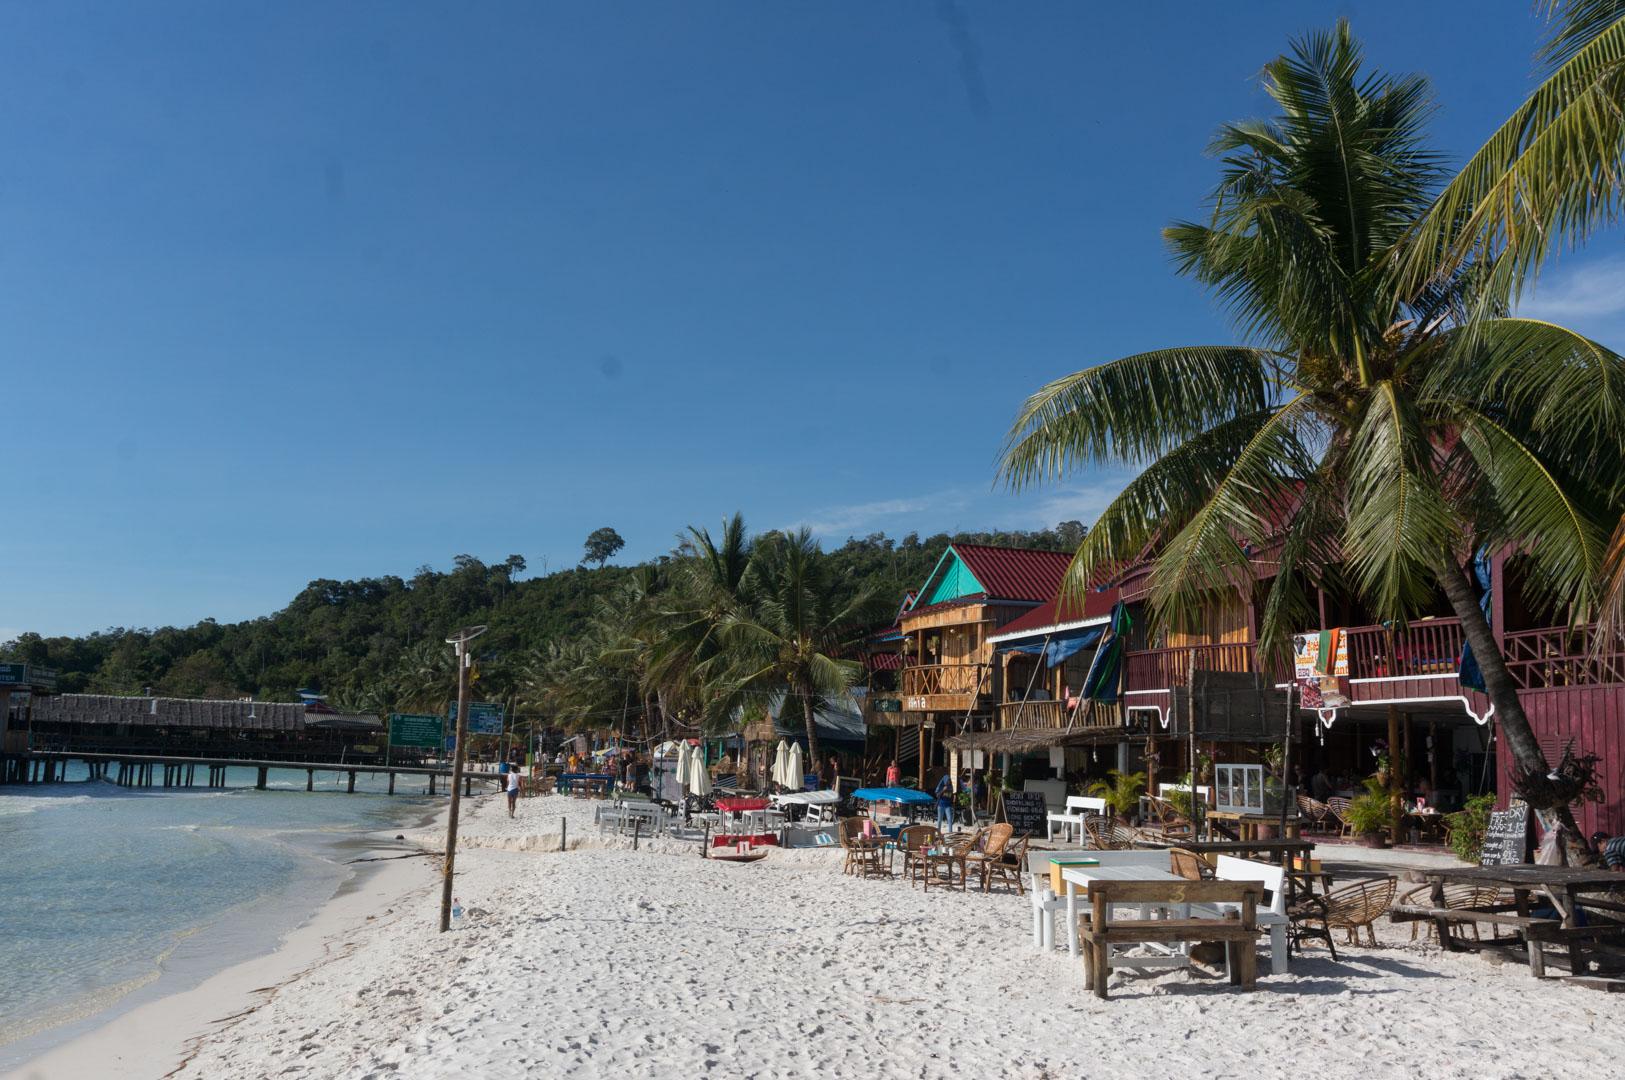 Koh Rong Hauptstrand Main Beach